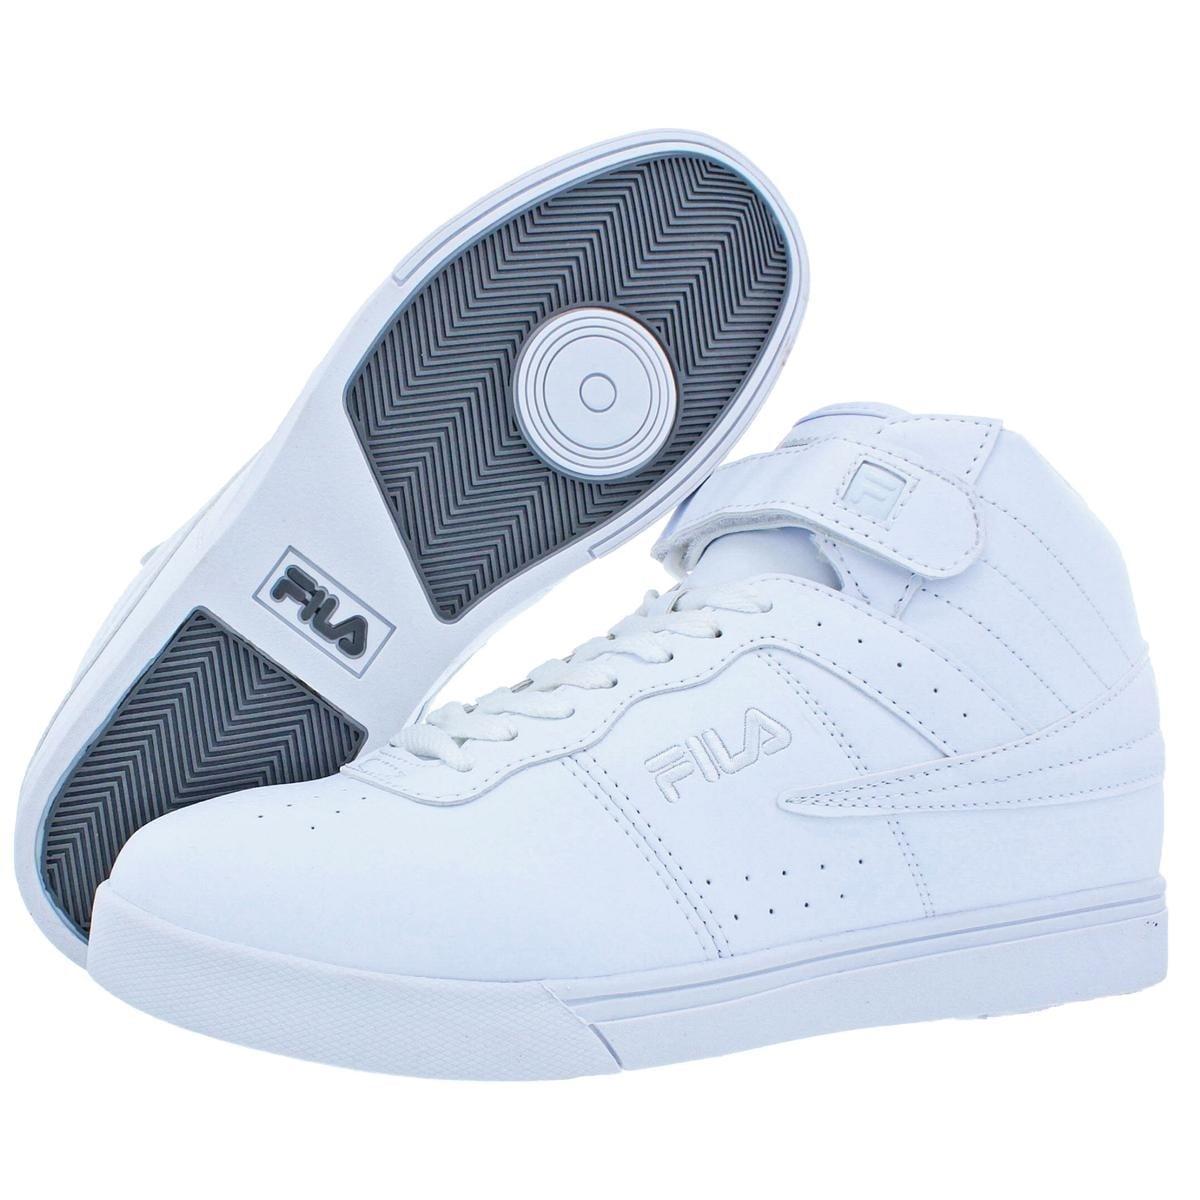 e695ac3280d Fila Mens Vulc 13 High Top Sneakers Faux Leather Contrast Trim